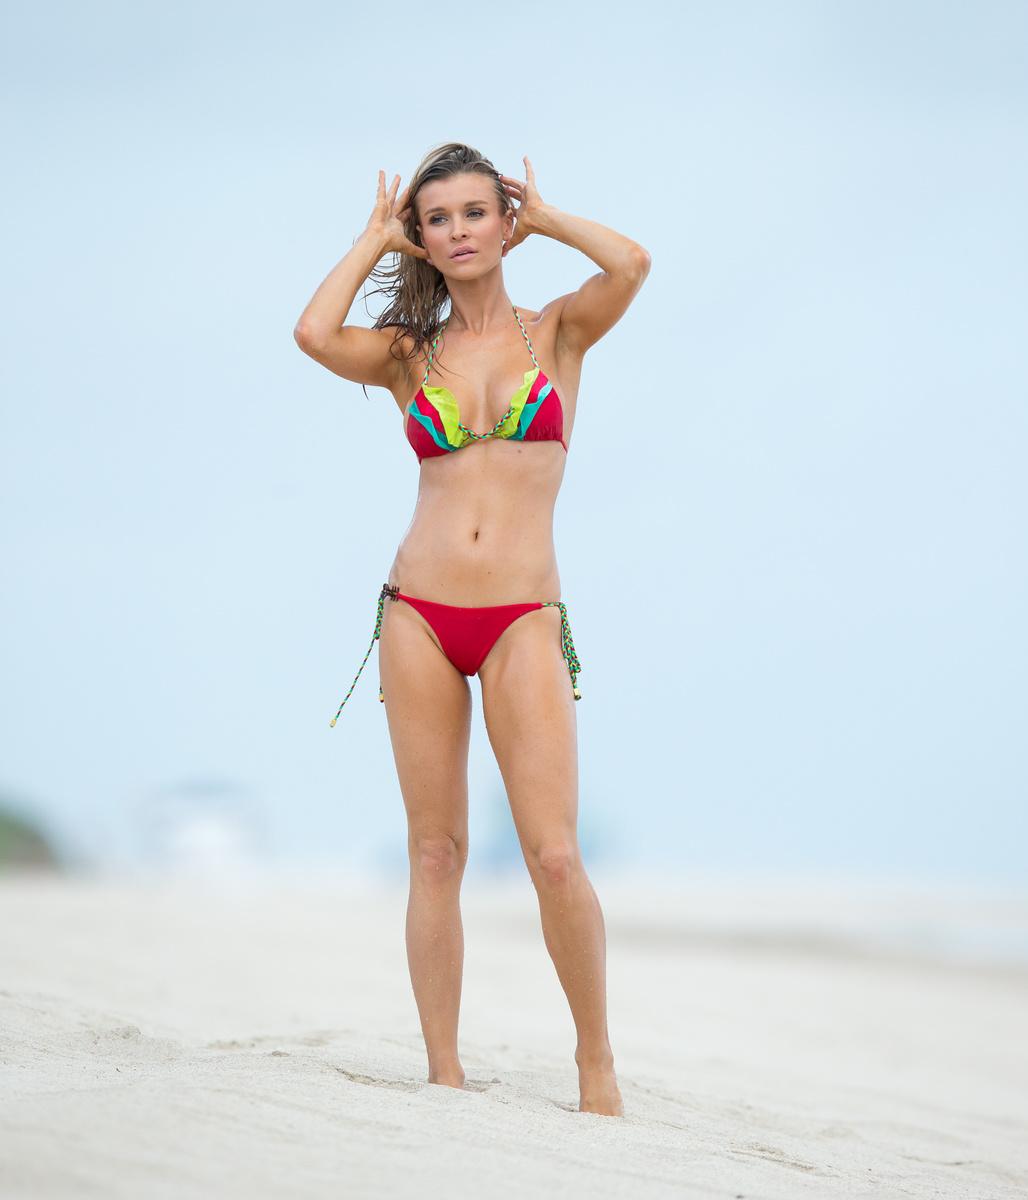 Джоанна Крупа в красном бикини с оборками